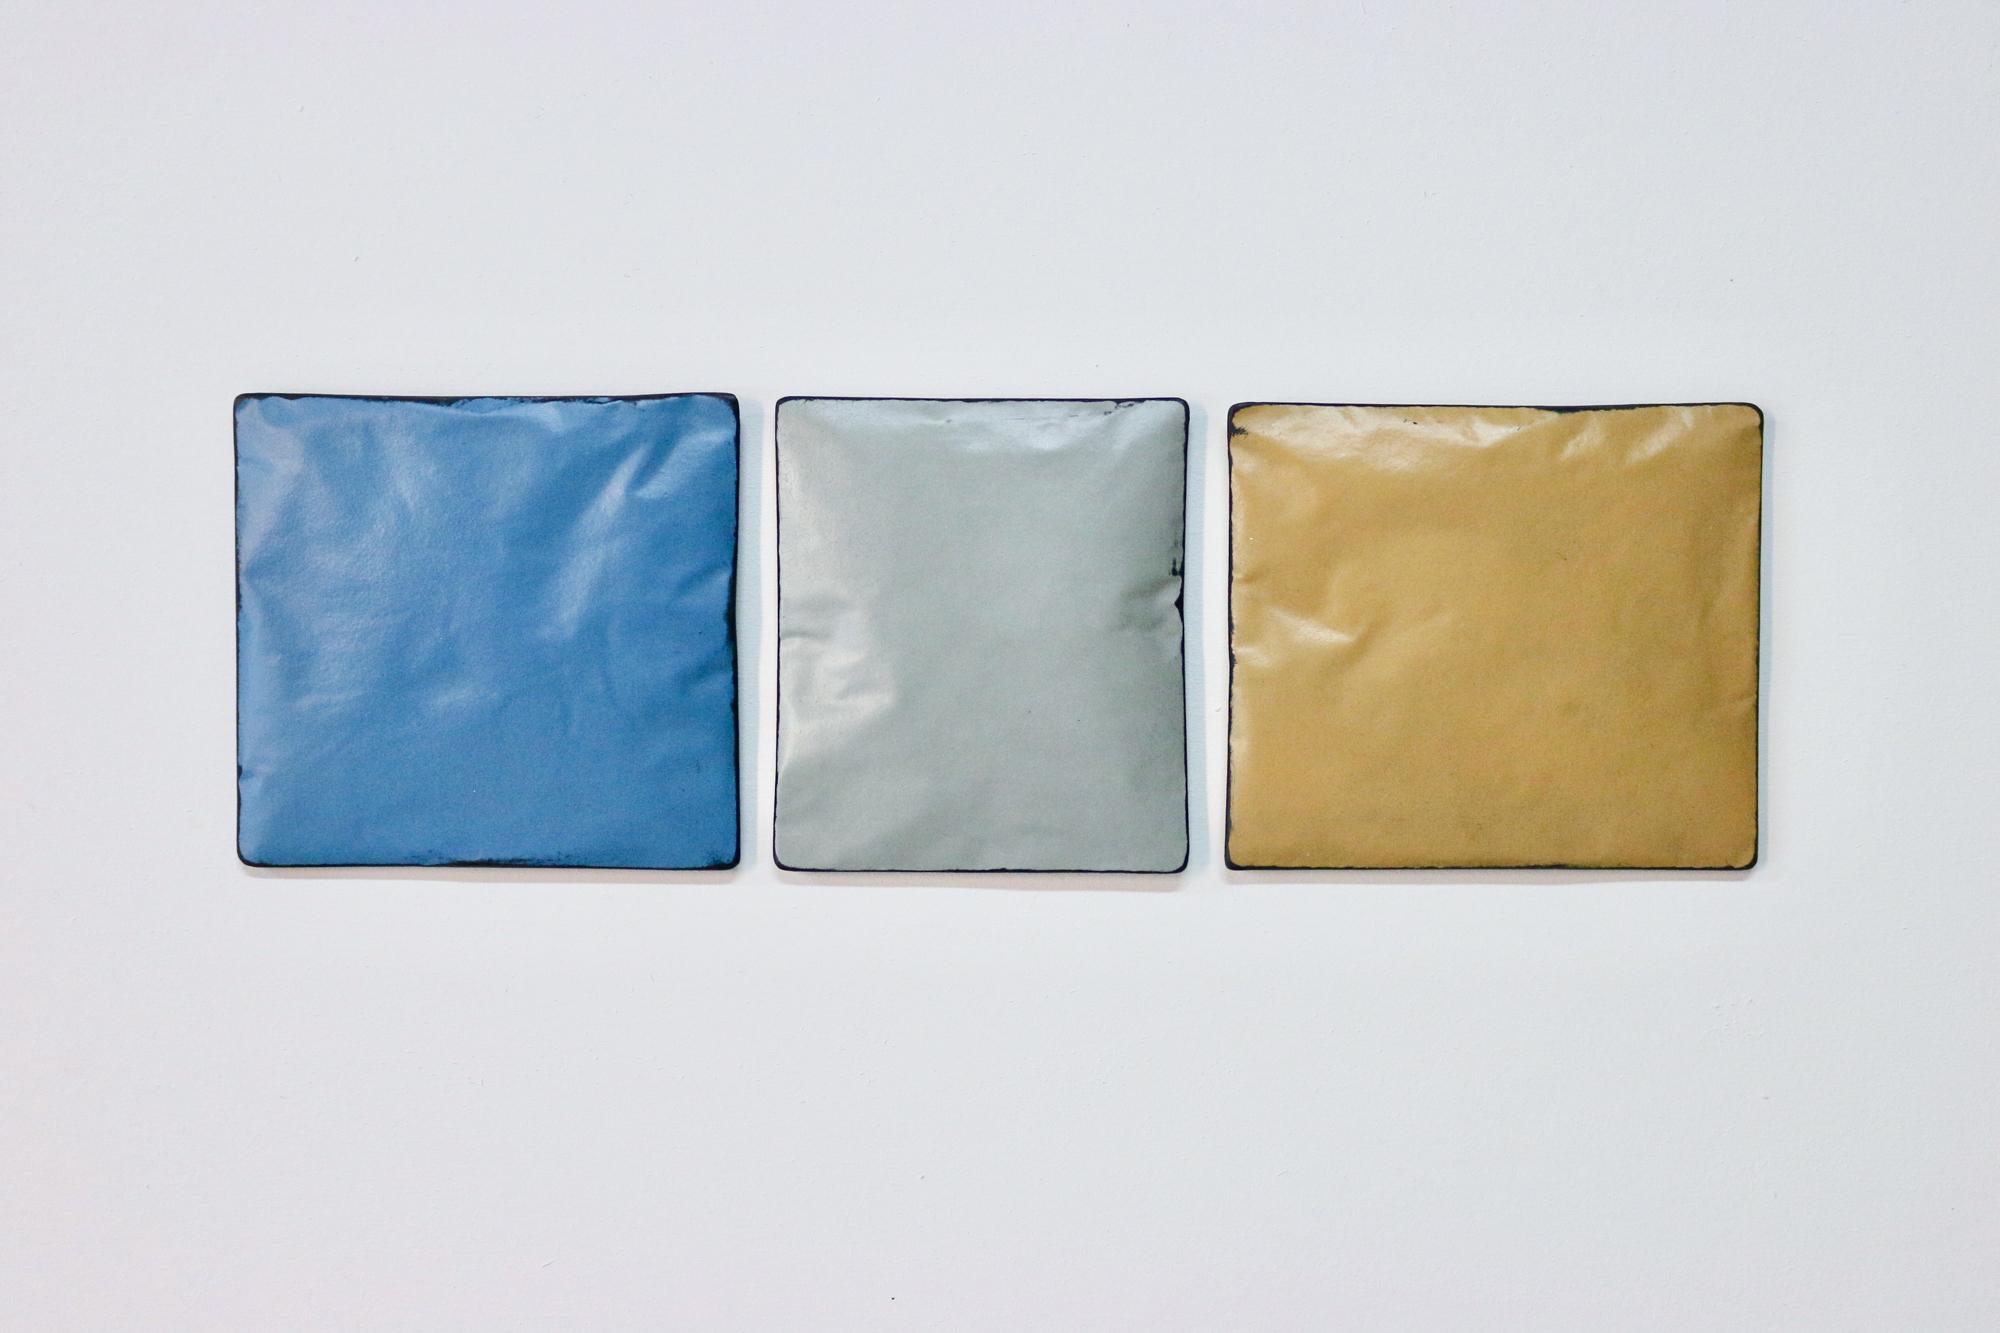 Johan De Wit, Untitled, 2018, Paper, Resin, Marble, Acrylic, 49 x 15 cm (3 pces), Affinity Art